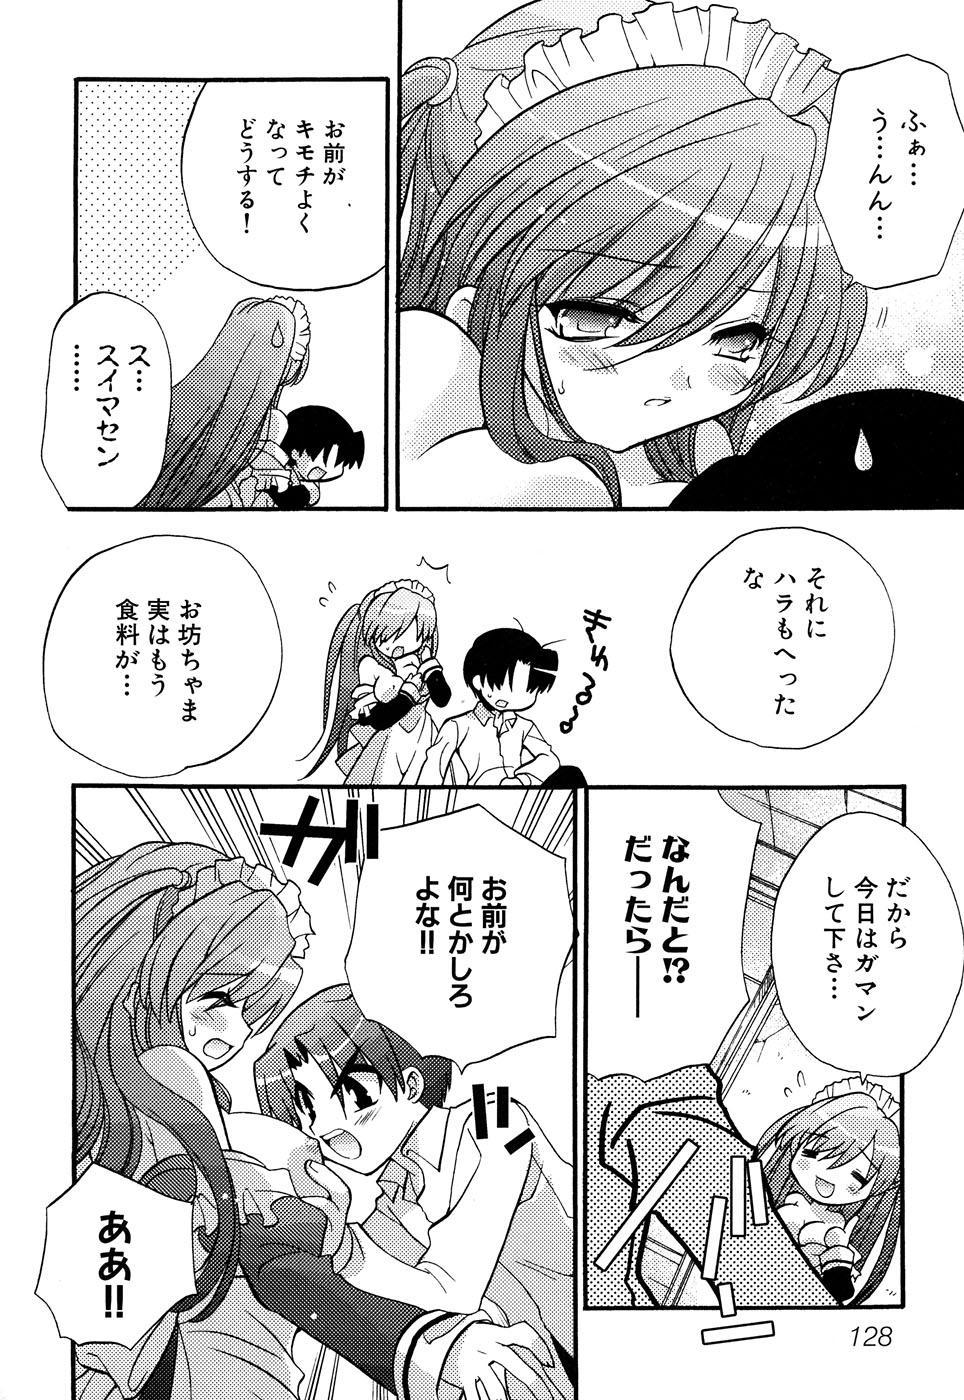 Fechikko VS Series ROUND.2 Miko San VS Maid San 130